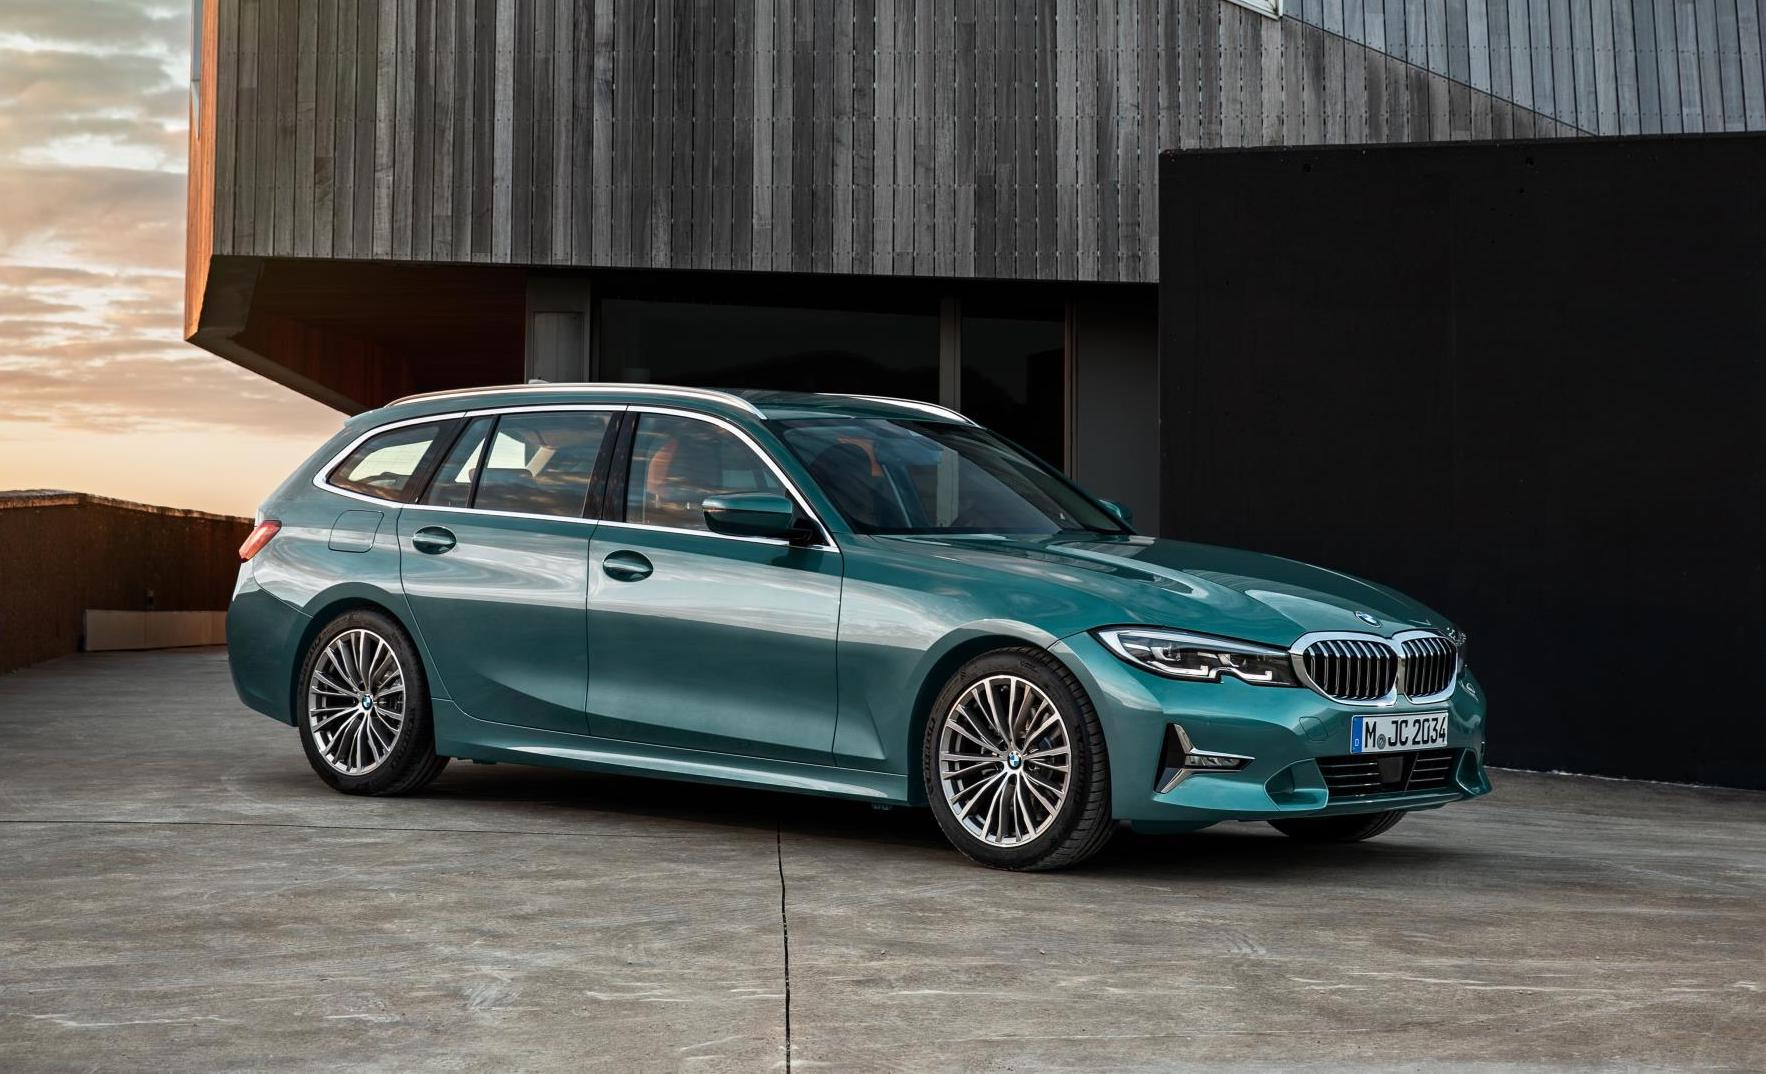 2020 Bmw 3 Series Touring G21 Wagon Revealed Performancedrive